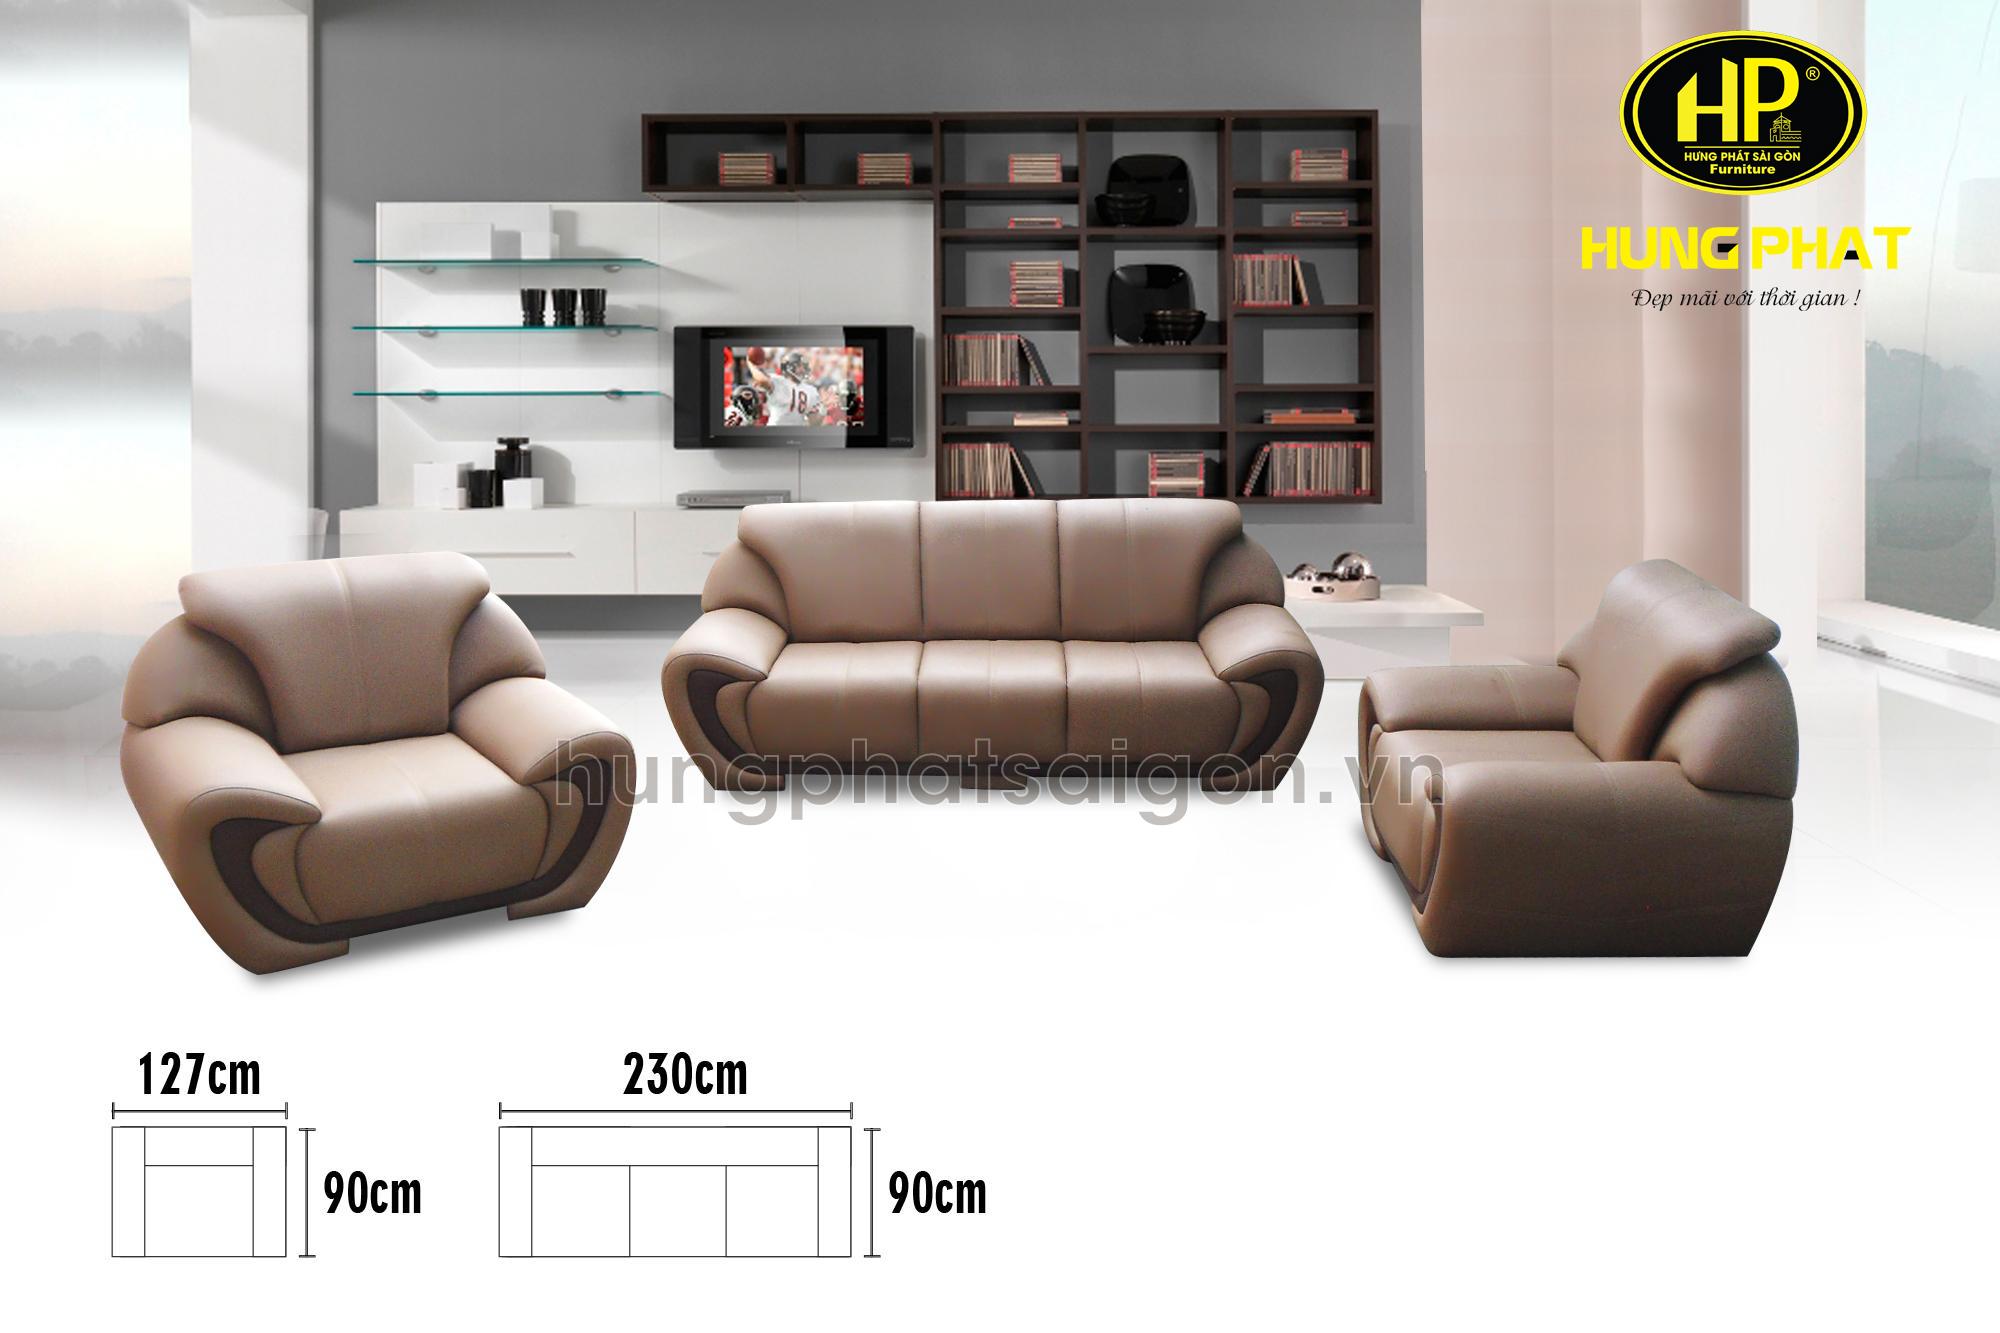 sofa van phong hungphatsaigon.vn